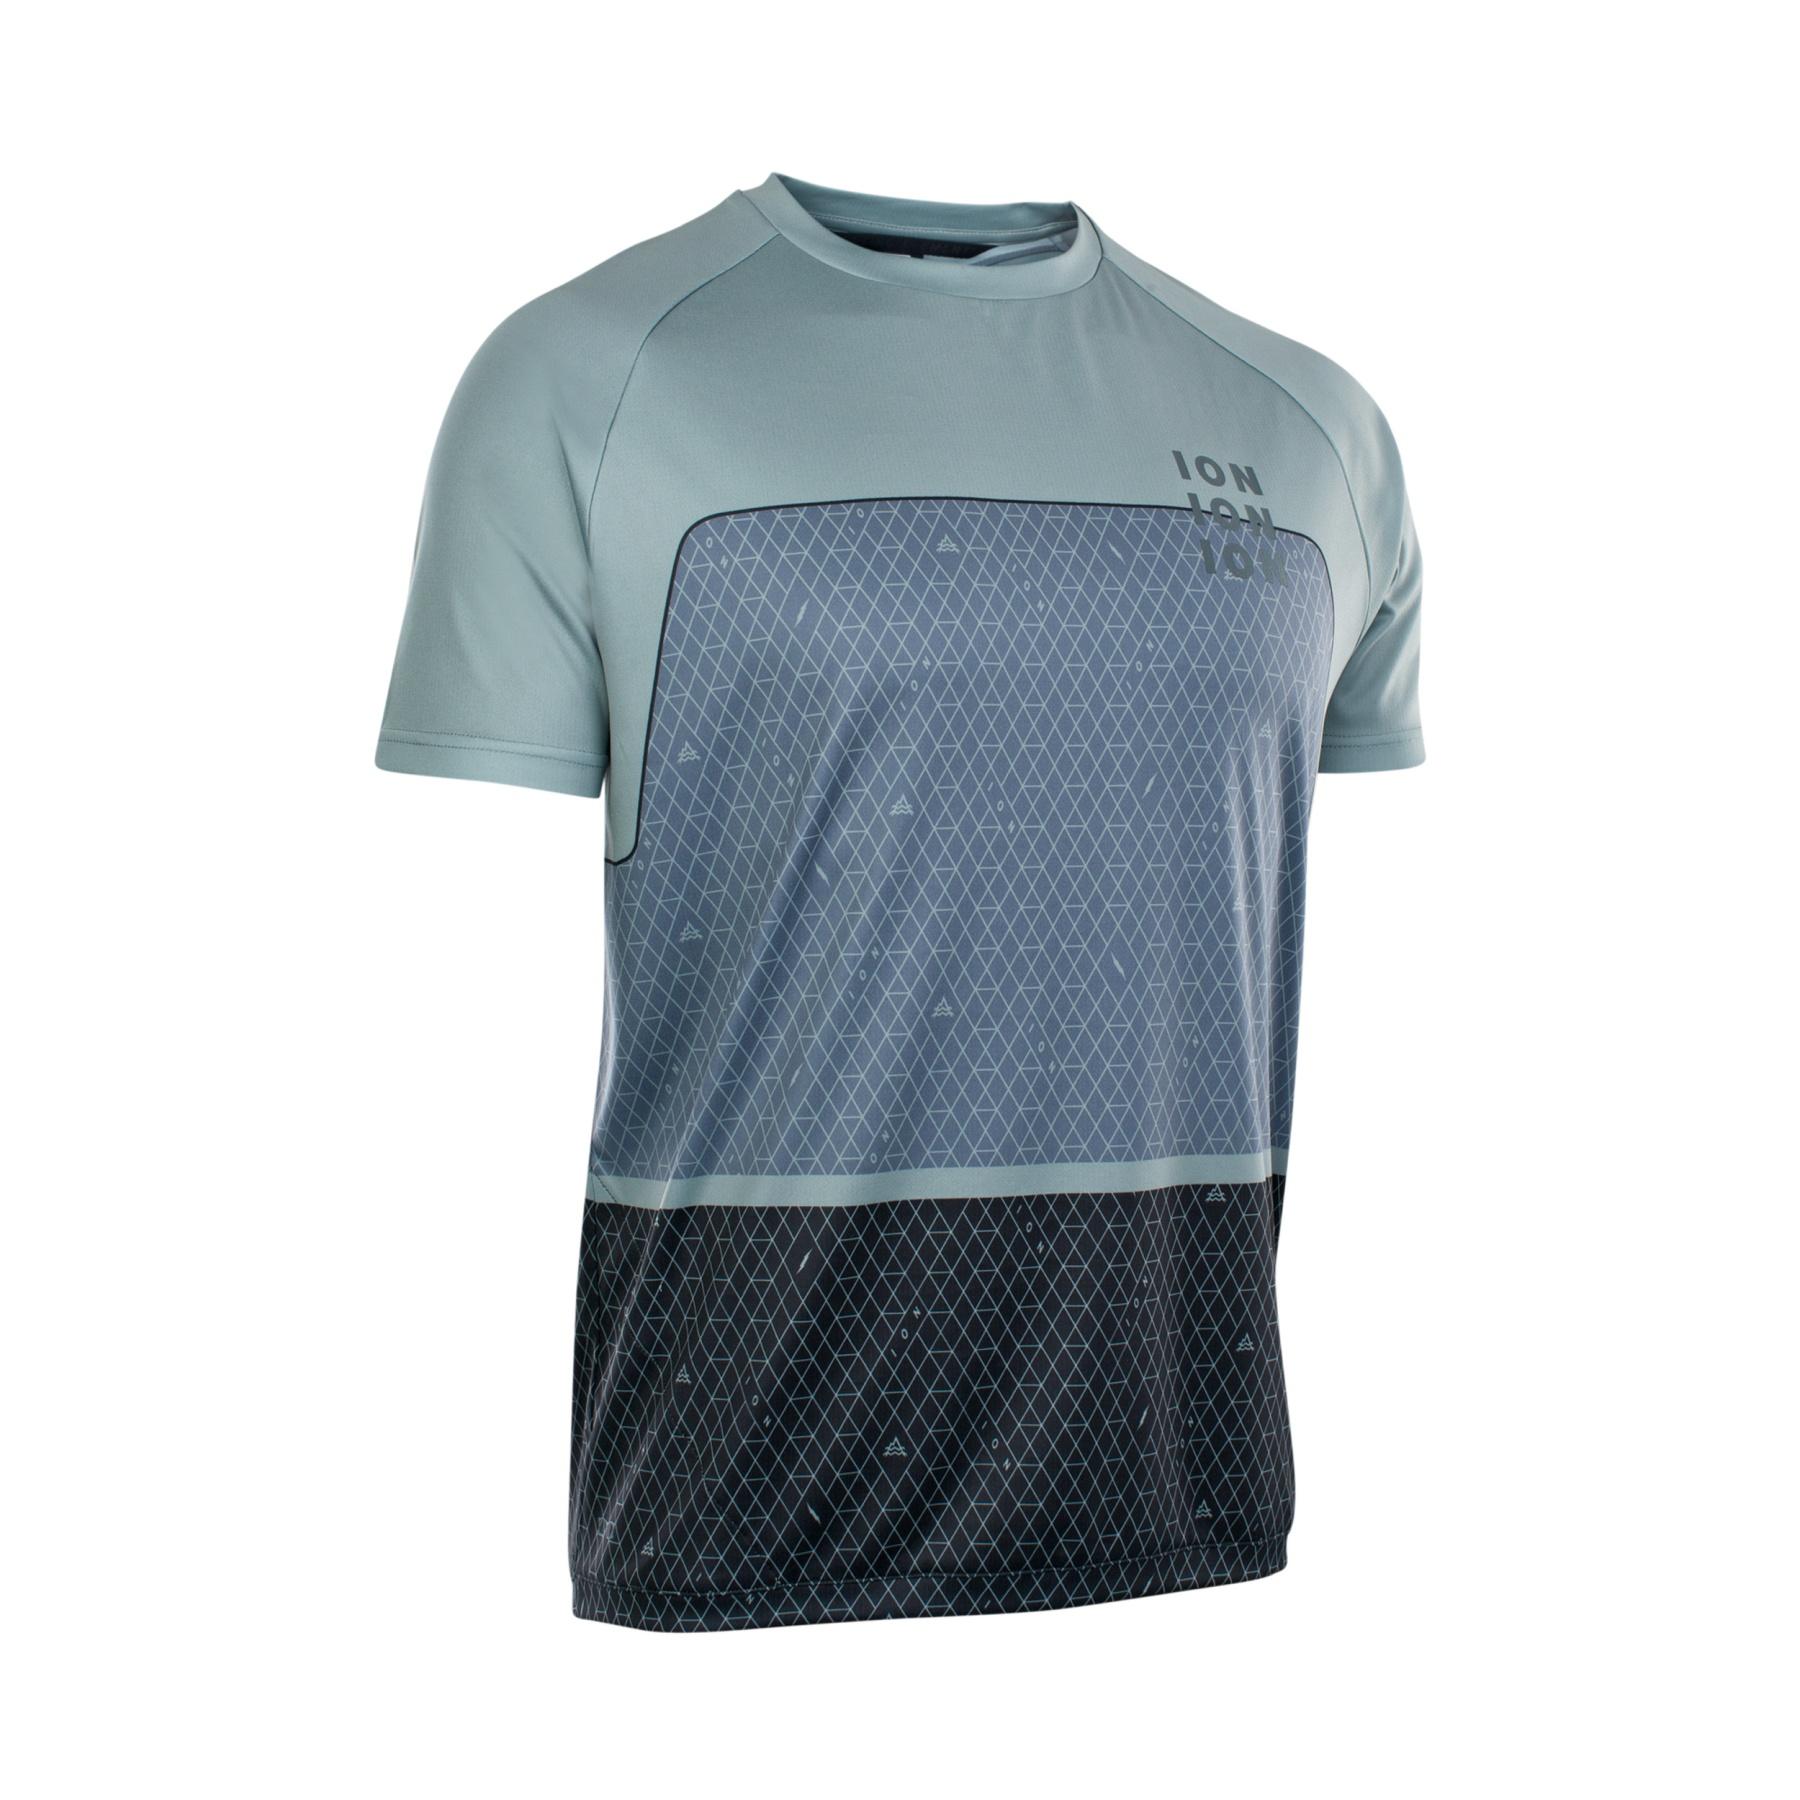 ION Bike T-Shirt Traze Amp X - Tidal Green